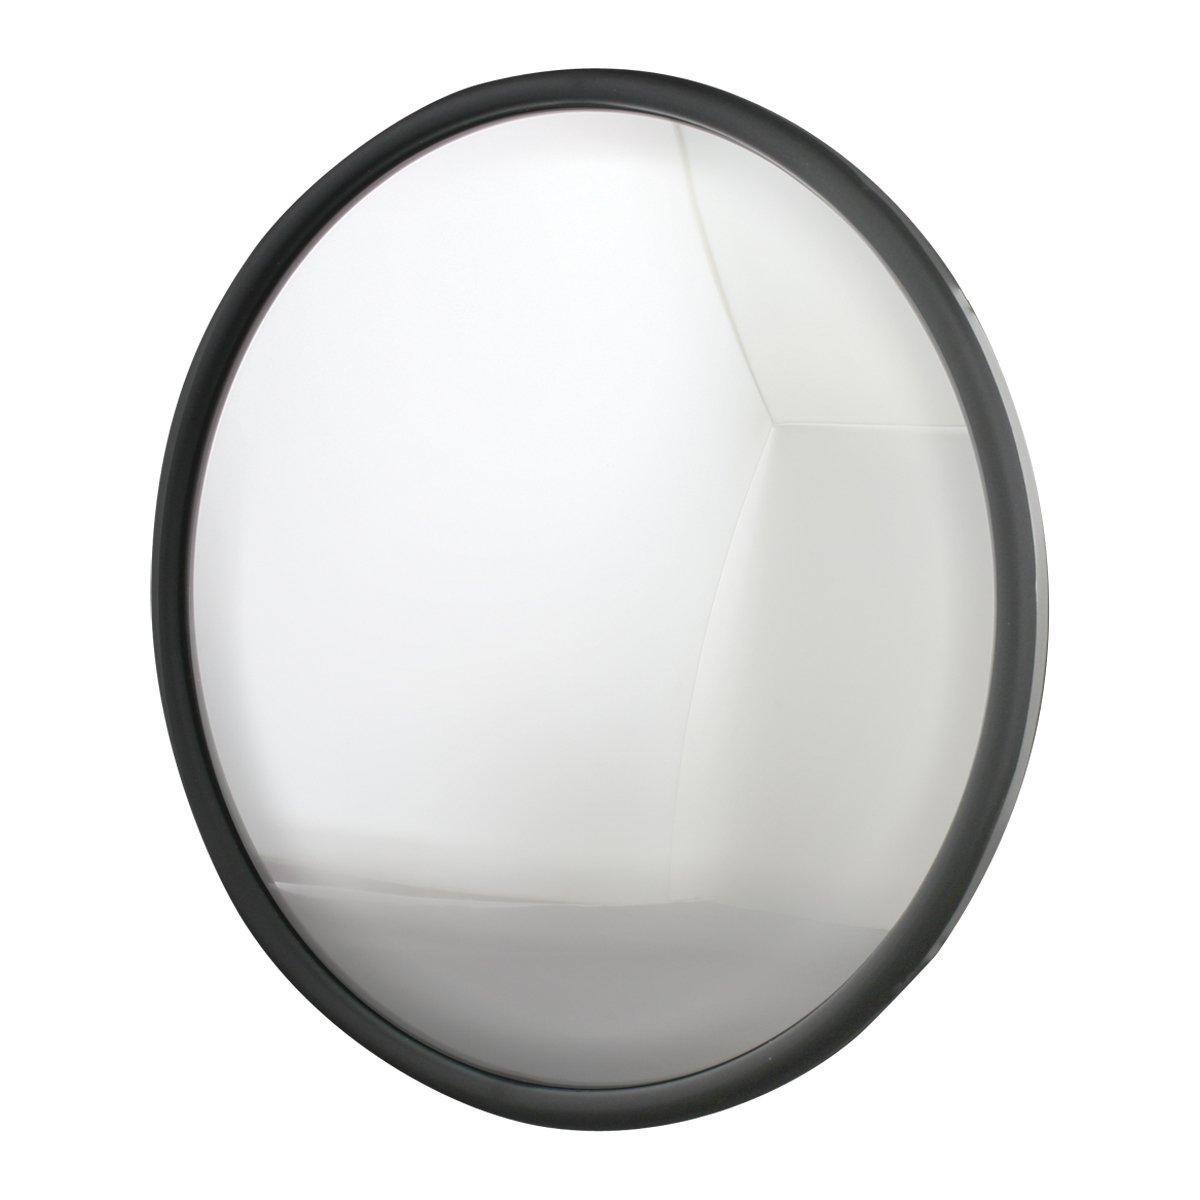 Grand General 33080 Chrome 8' Convex Blind Spot Mirror with'L' Bracket